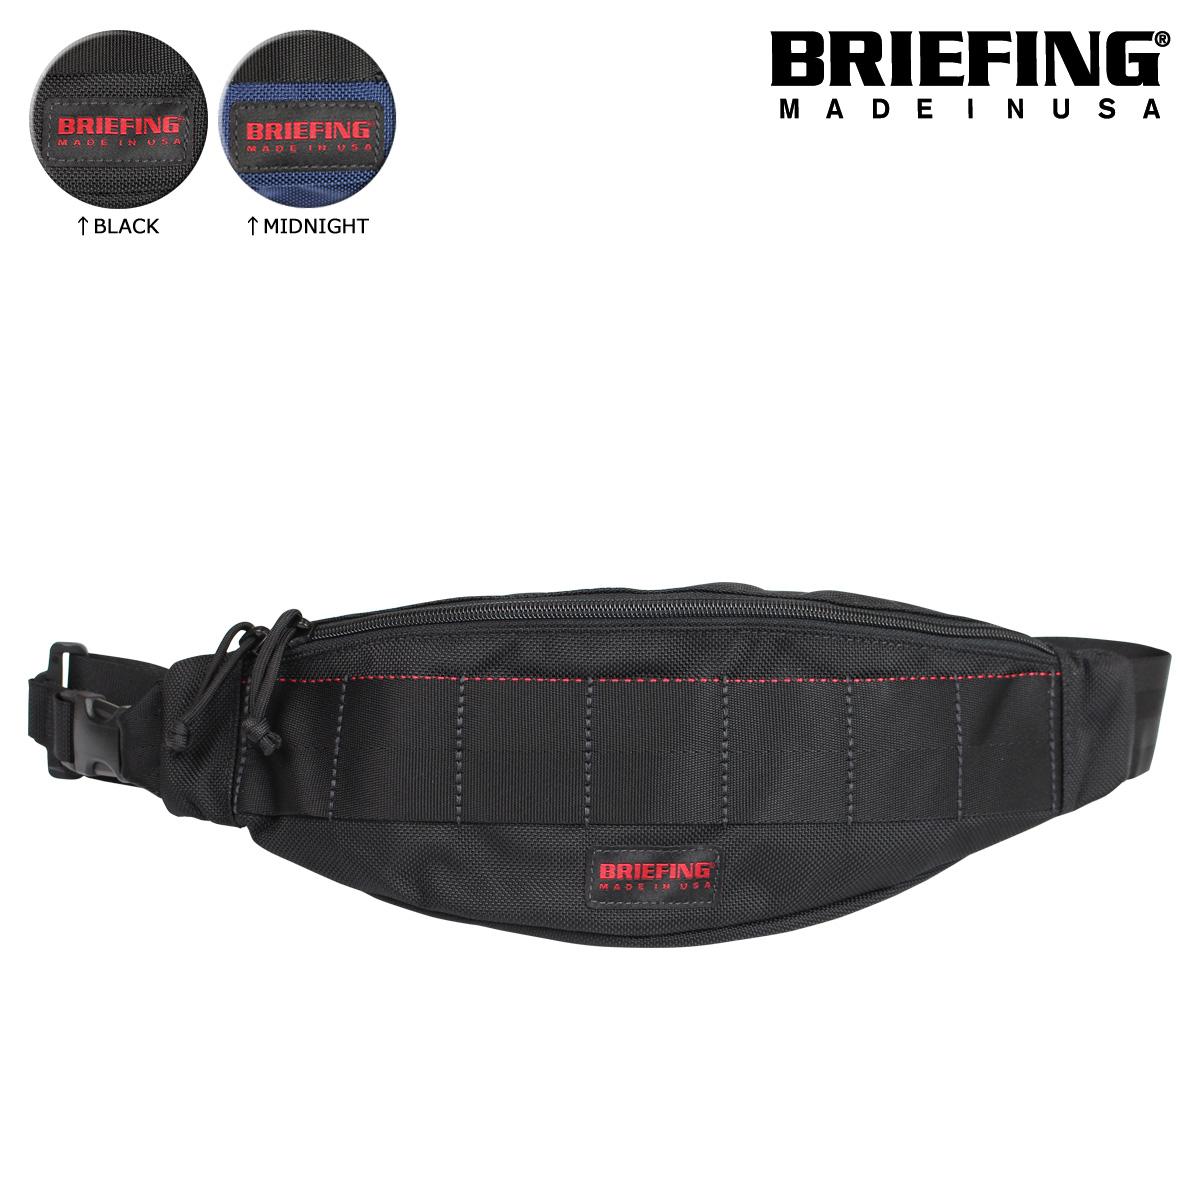 [SOLD OUT] briefing BRIEFING body bag bum-bag BRF071219 men